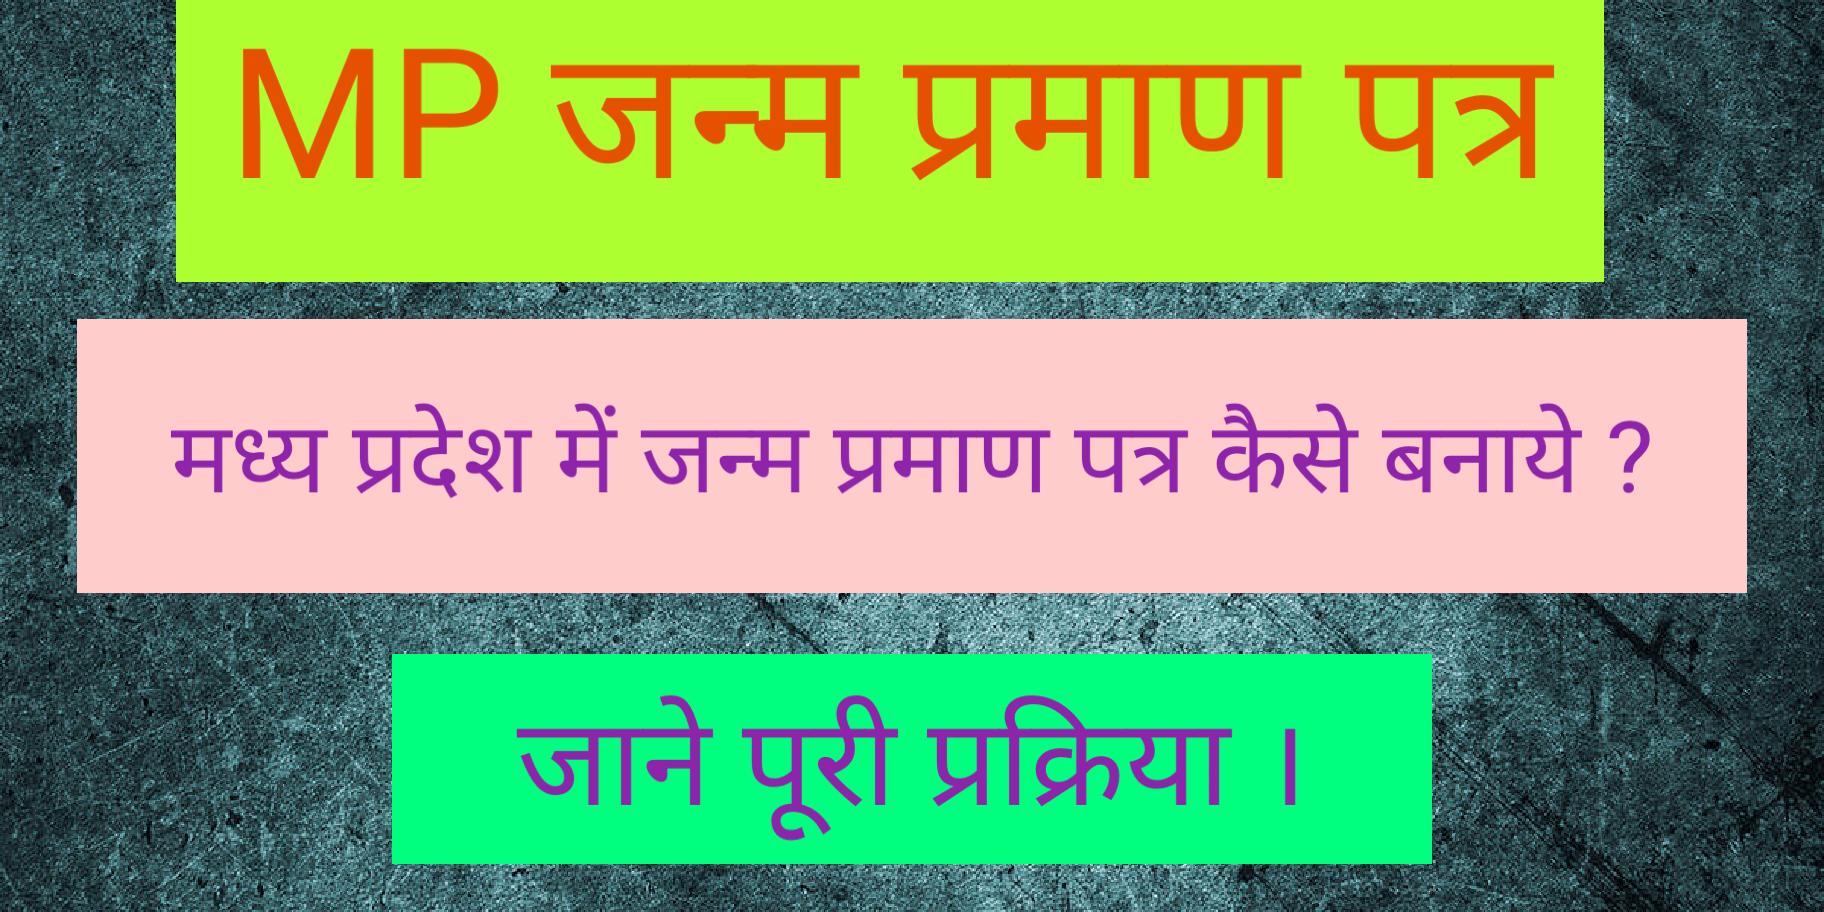 एमपी जन्म प्रमाण पत्र एप्लीकेशन फॉर्म | ऑनलाइन आवेदन | Janam Praman Patra MP |